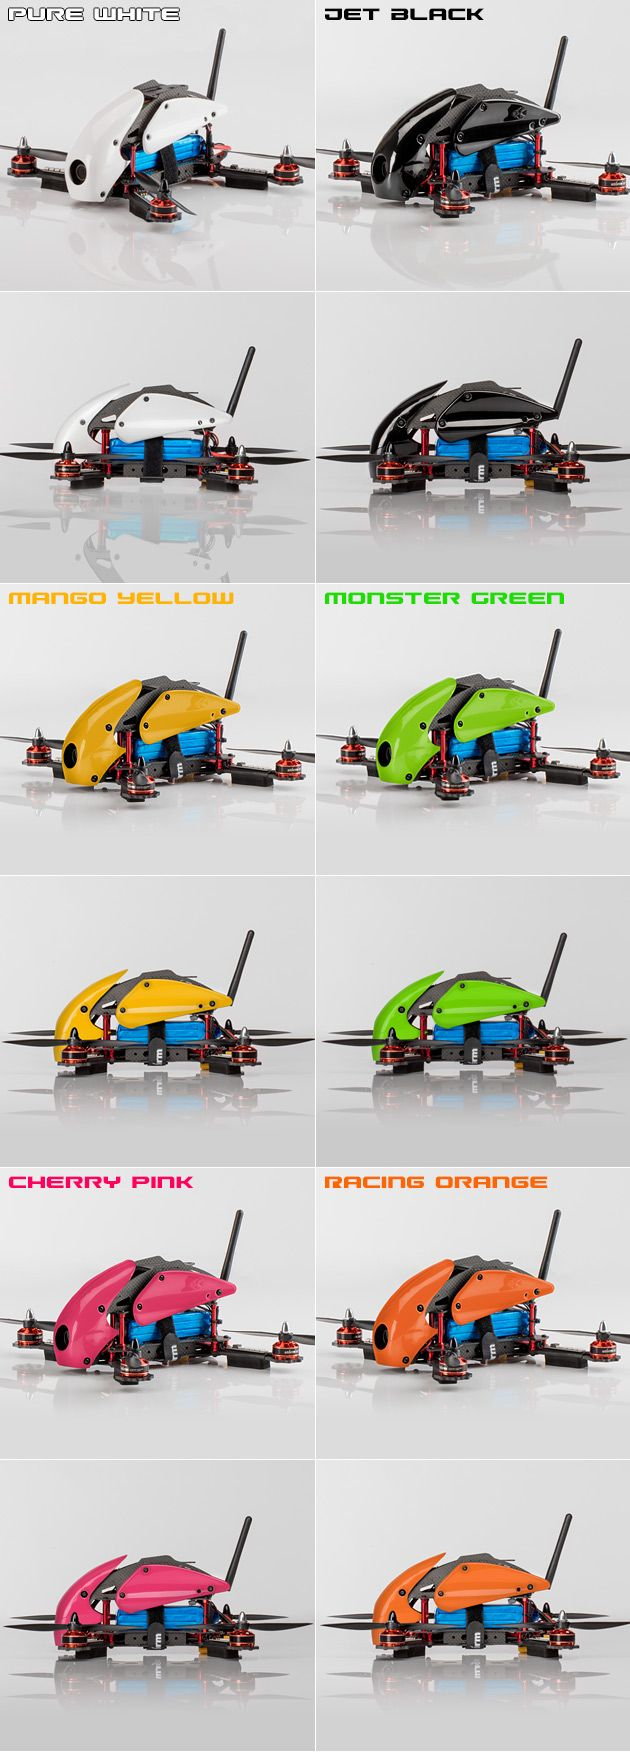 STORM Racing Drone (RTF / SRD280) www.helipal.com/... glossy finish Canopy